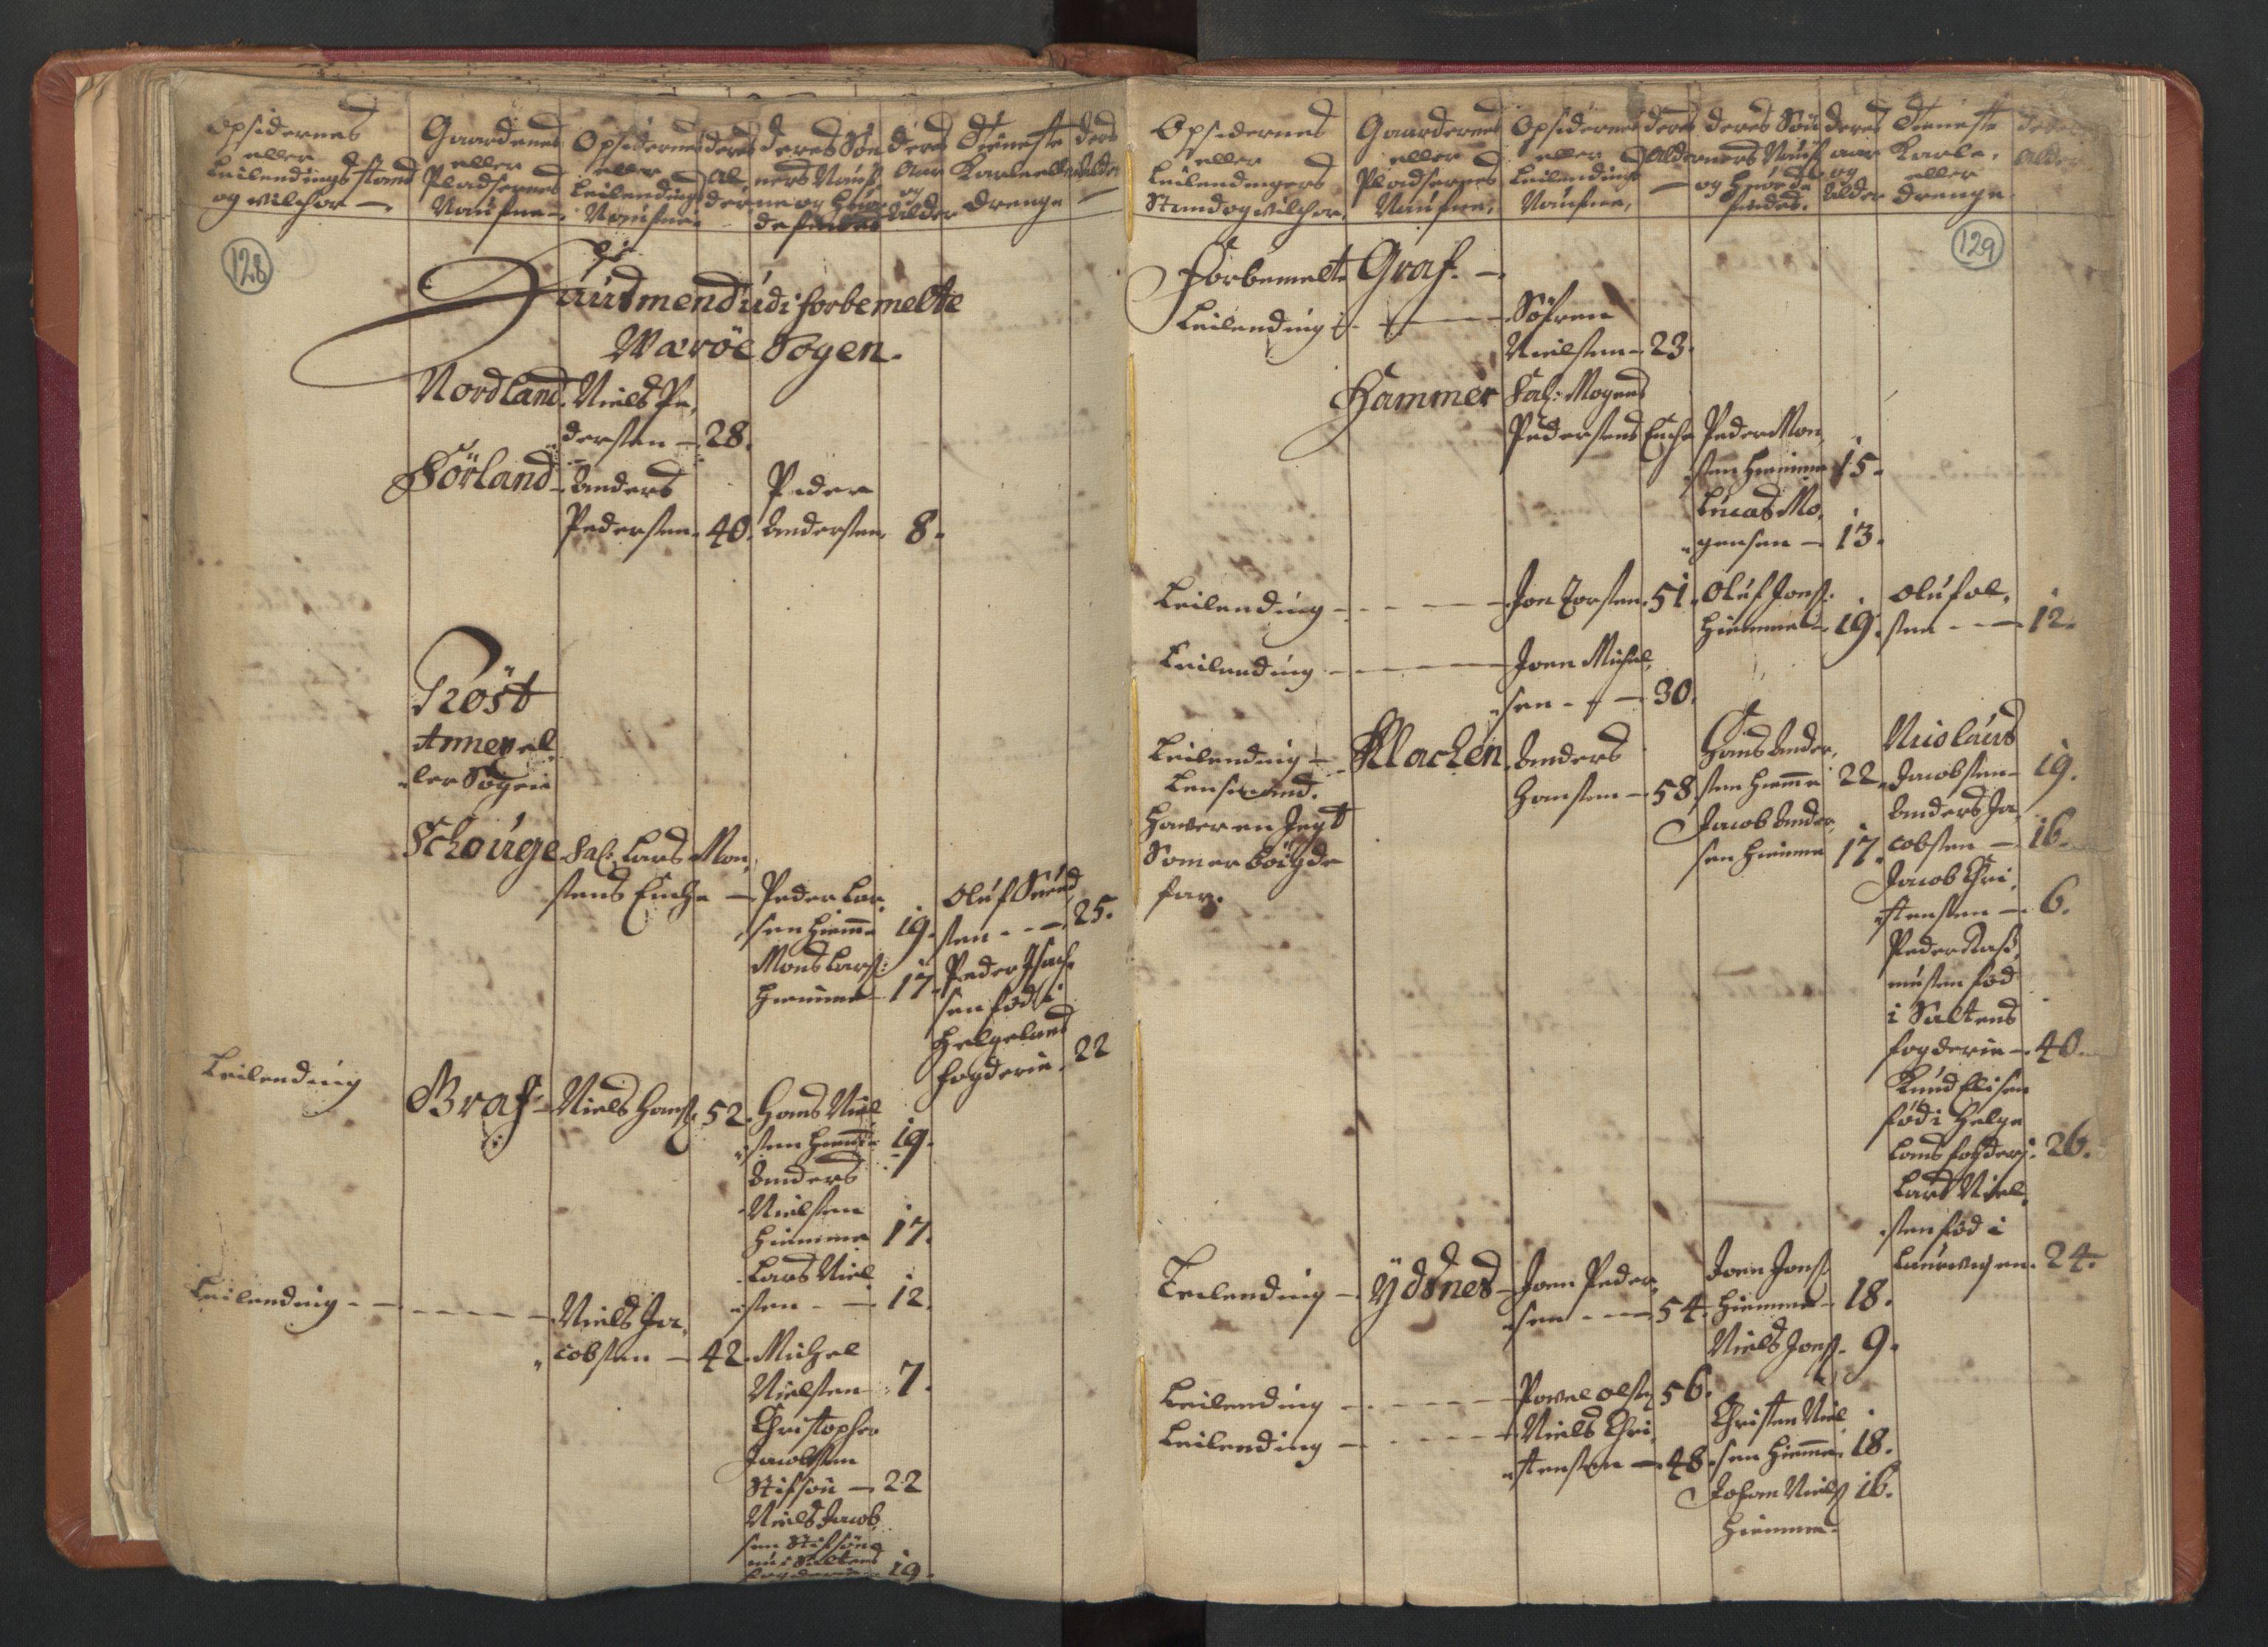 RA, Manntallet 1701, nr. 18: Vesterålen, Andenes og Lofoten fogderi, 1701, s. 128-129